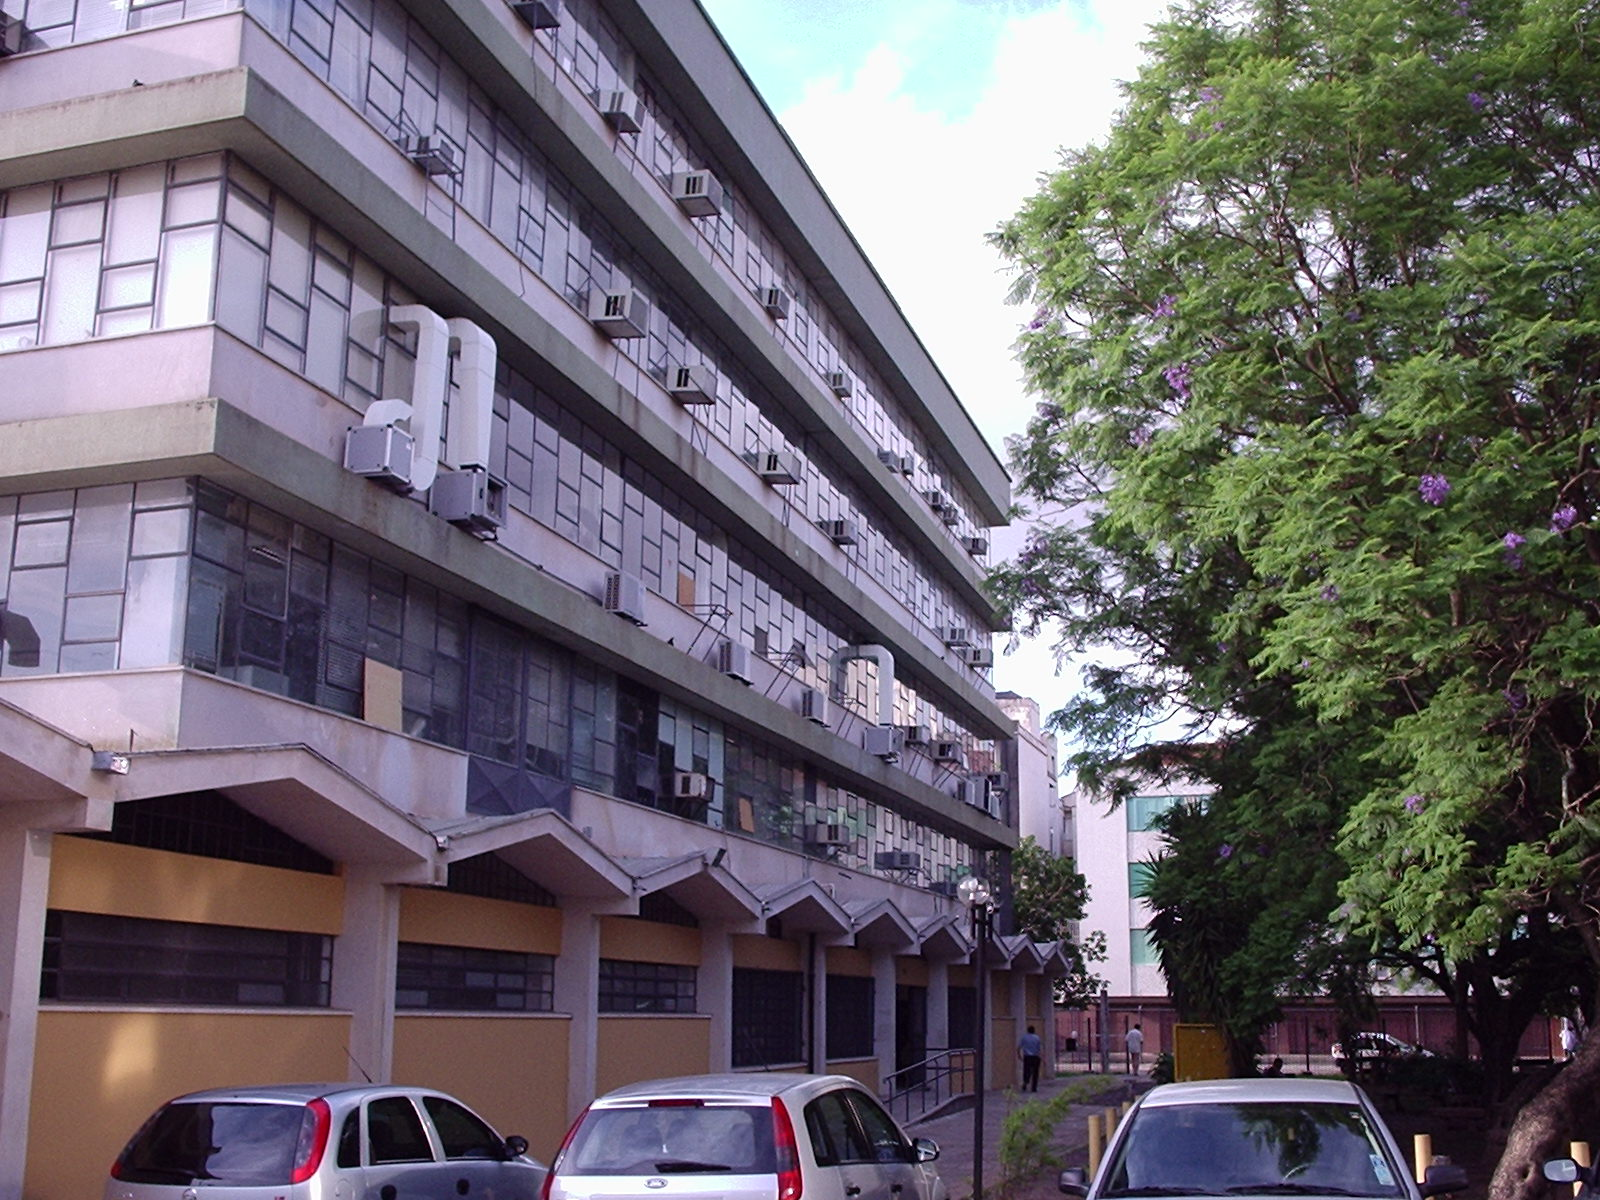 Federal University of Rio Grande do Sul.